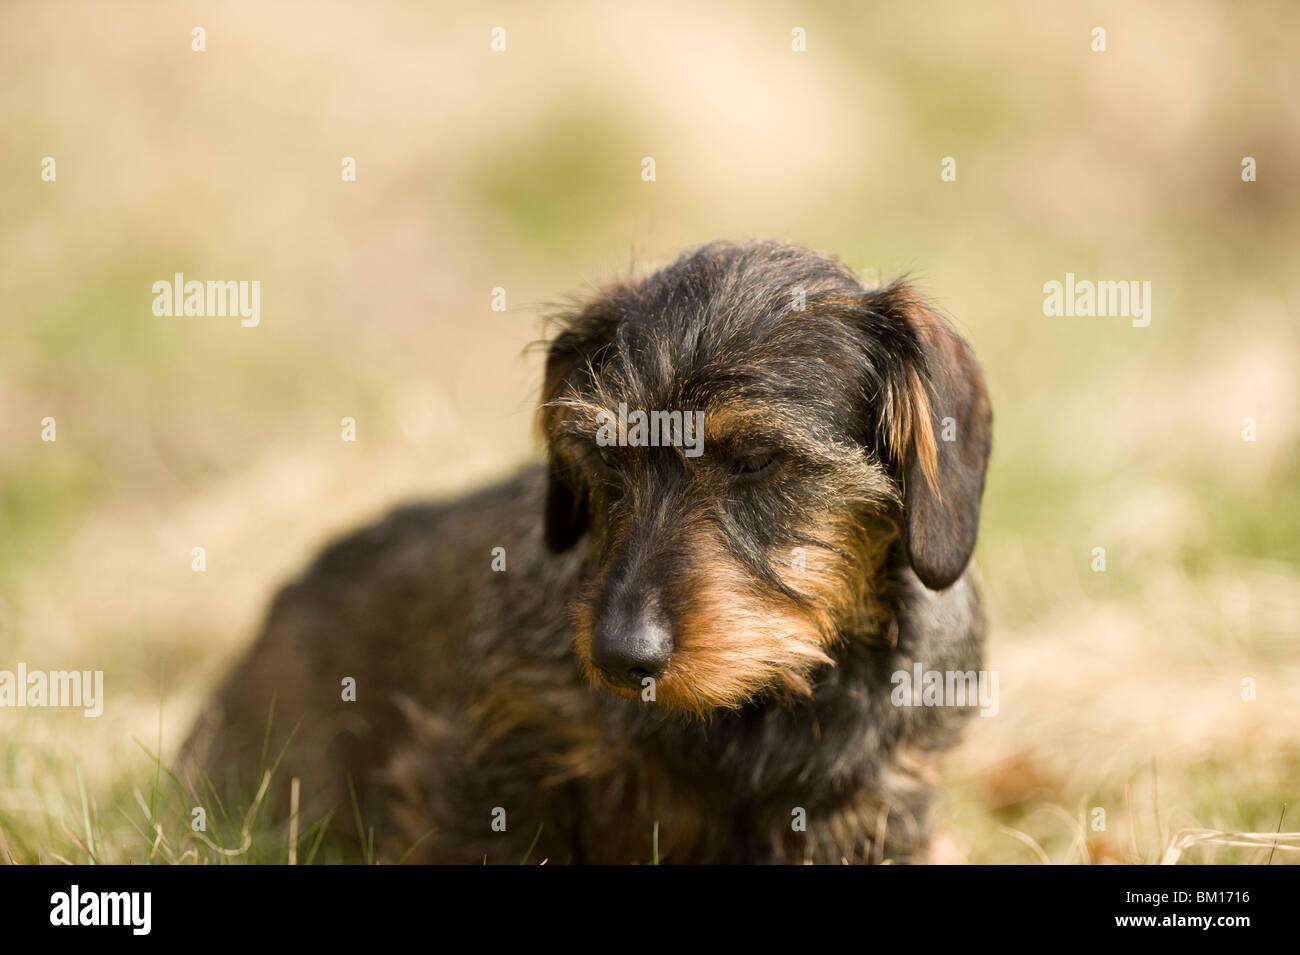 Dachshund Hunting Dog Video